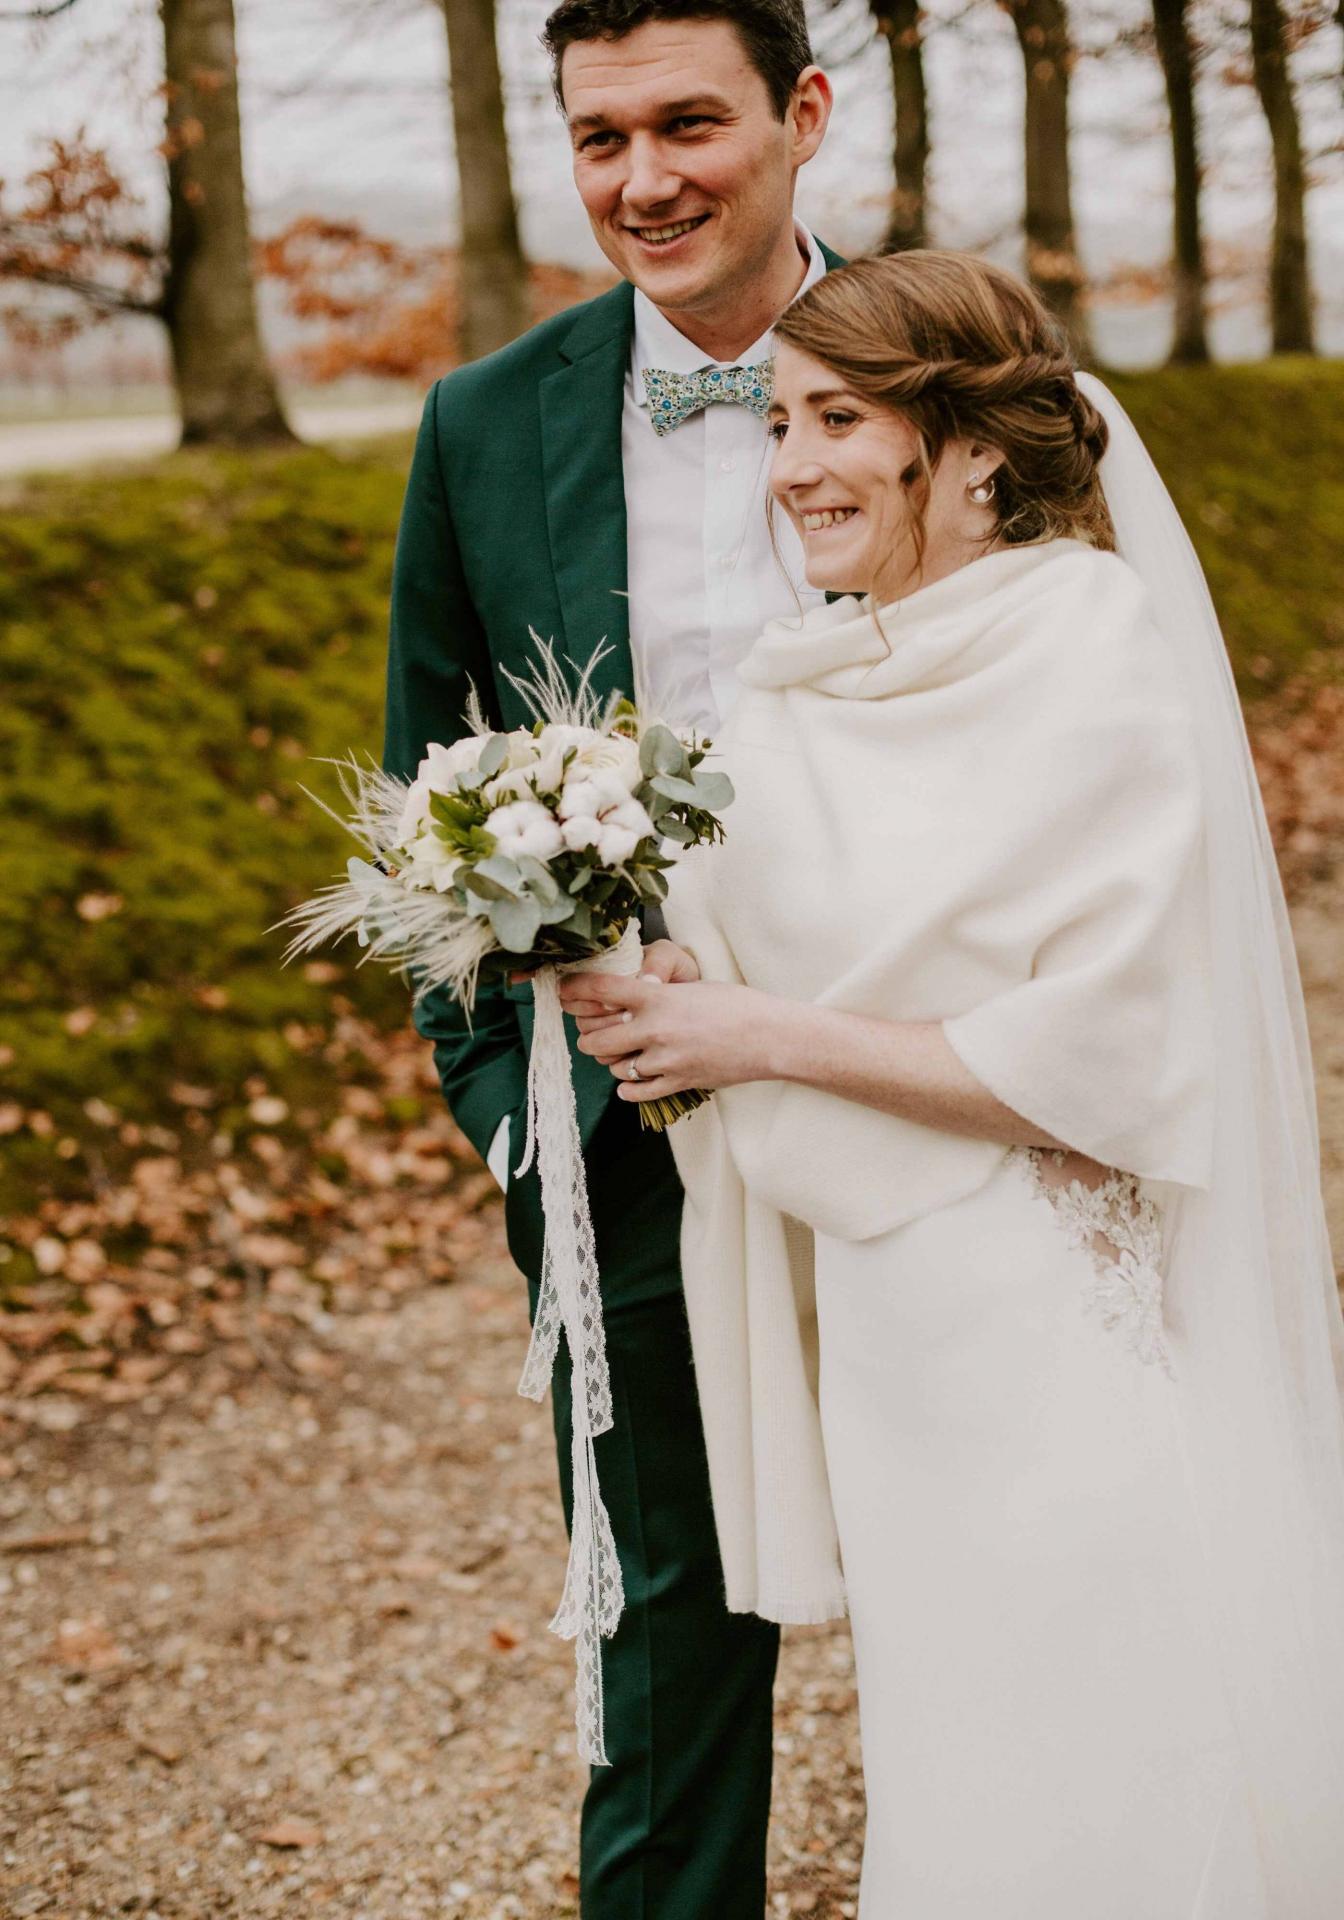 Mariage hiver mathieu marangoni